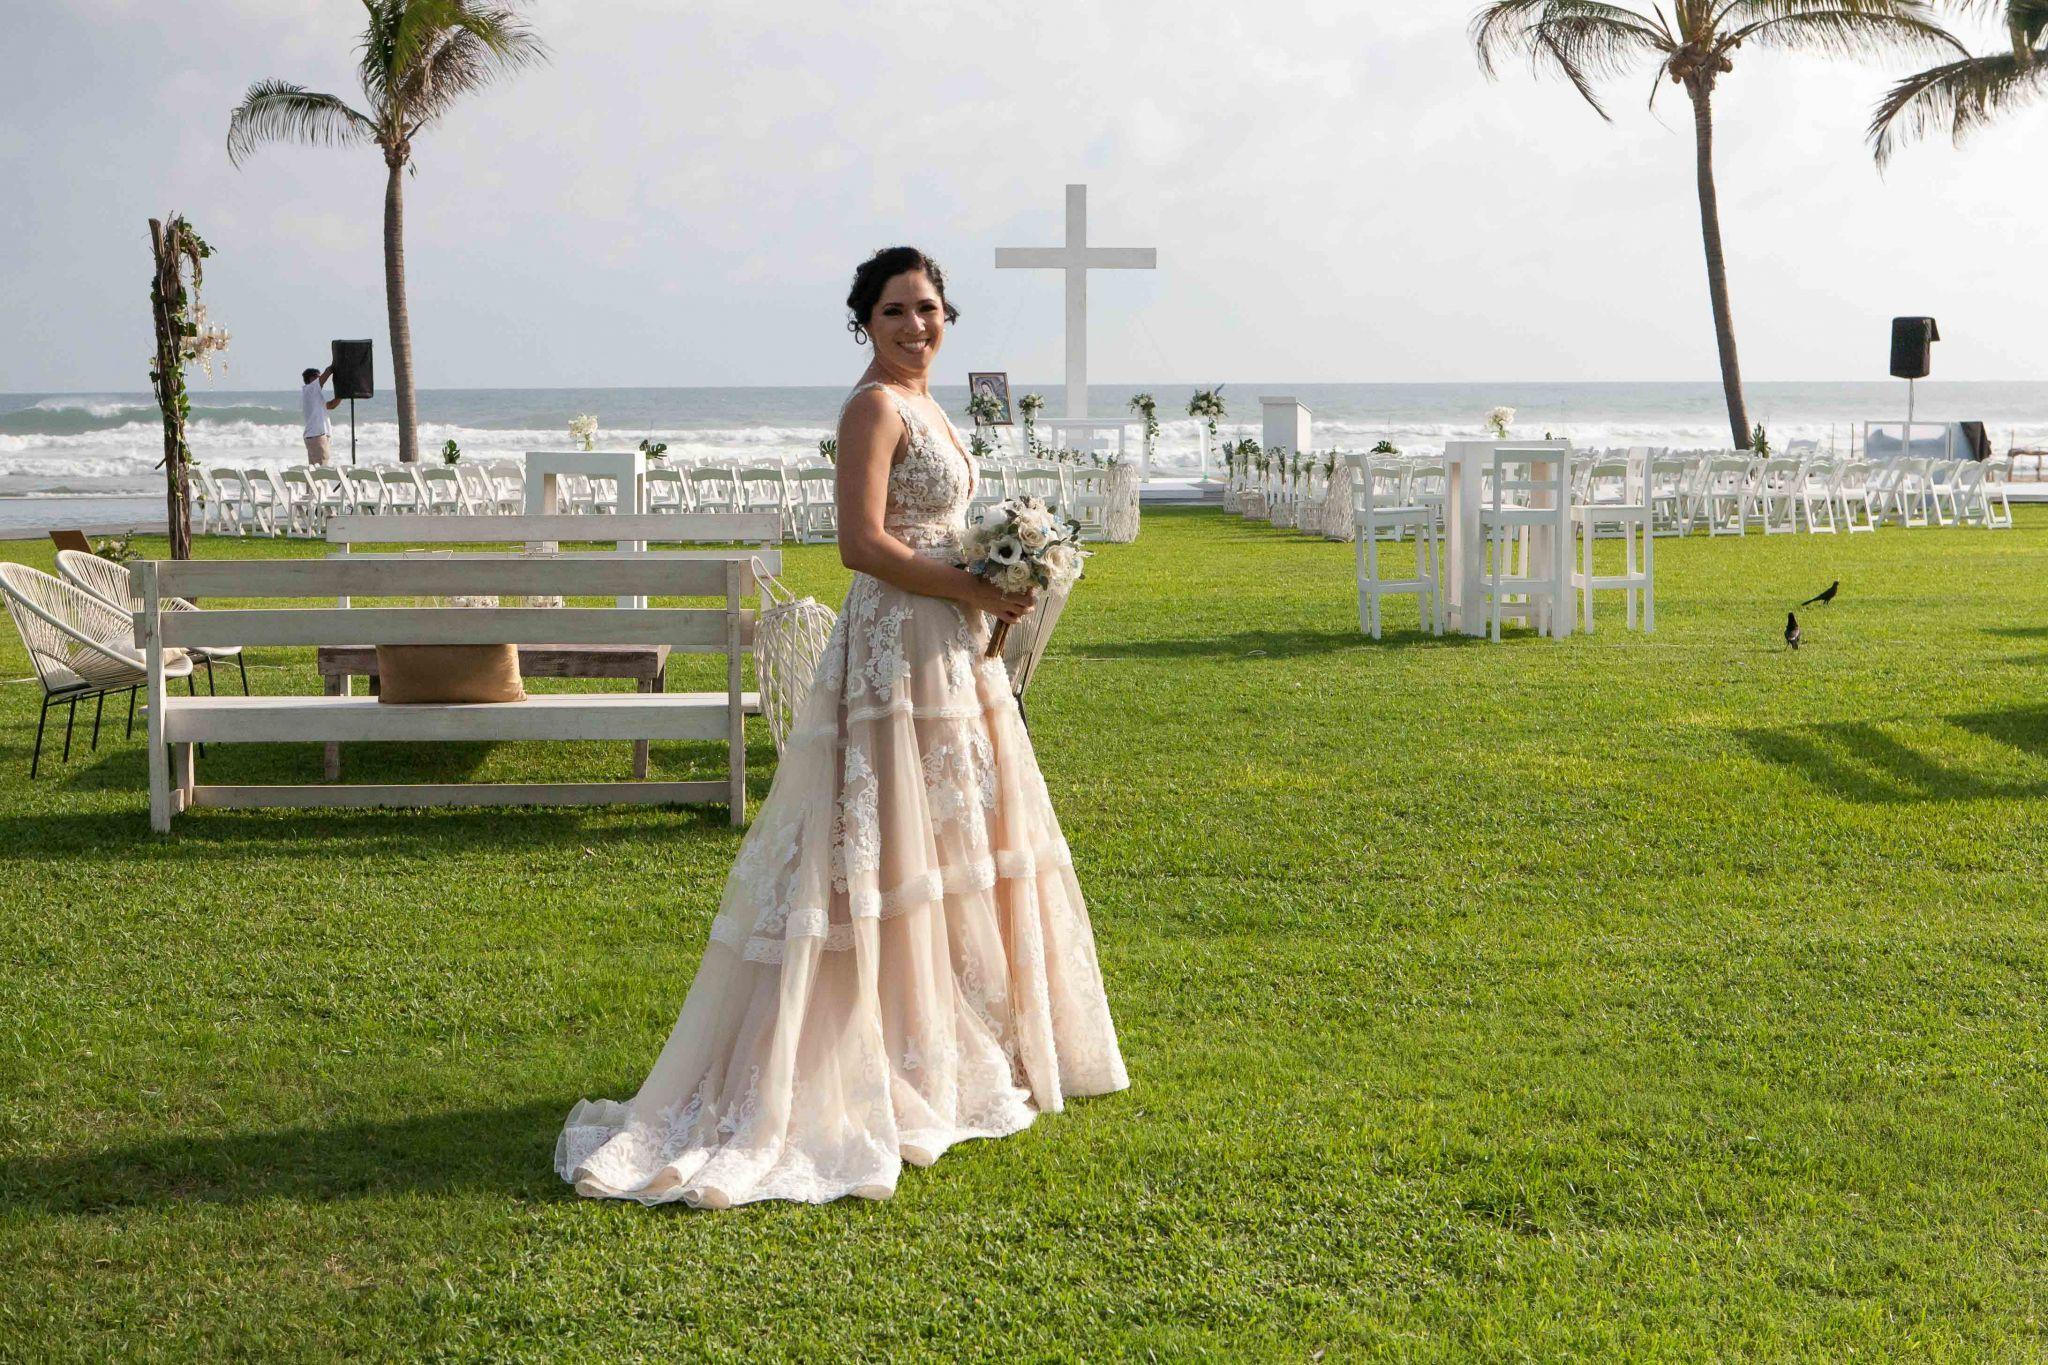 Randy Fenoli Michelle Wedding Dress Used, Size 8